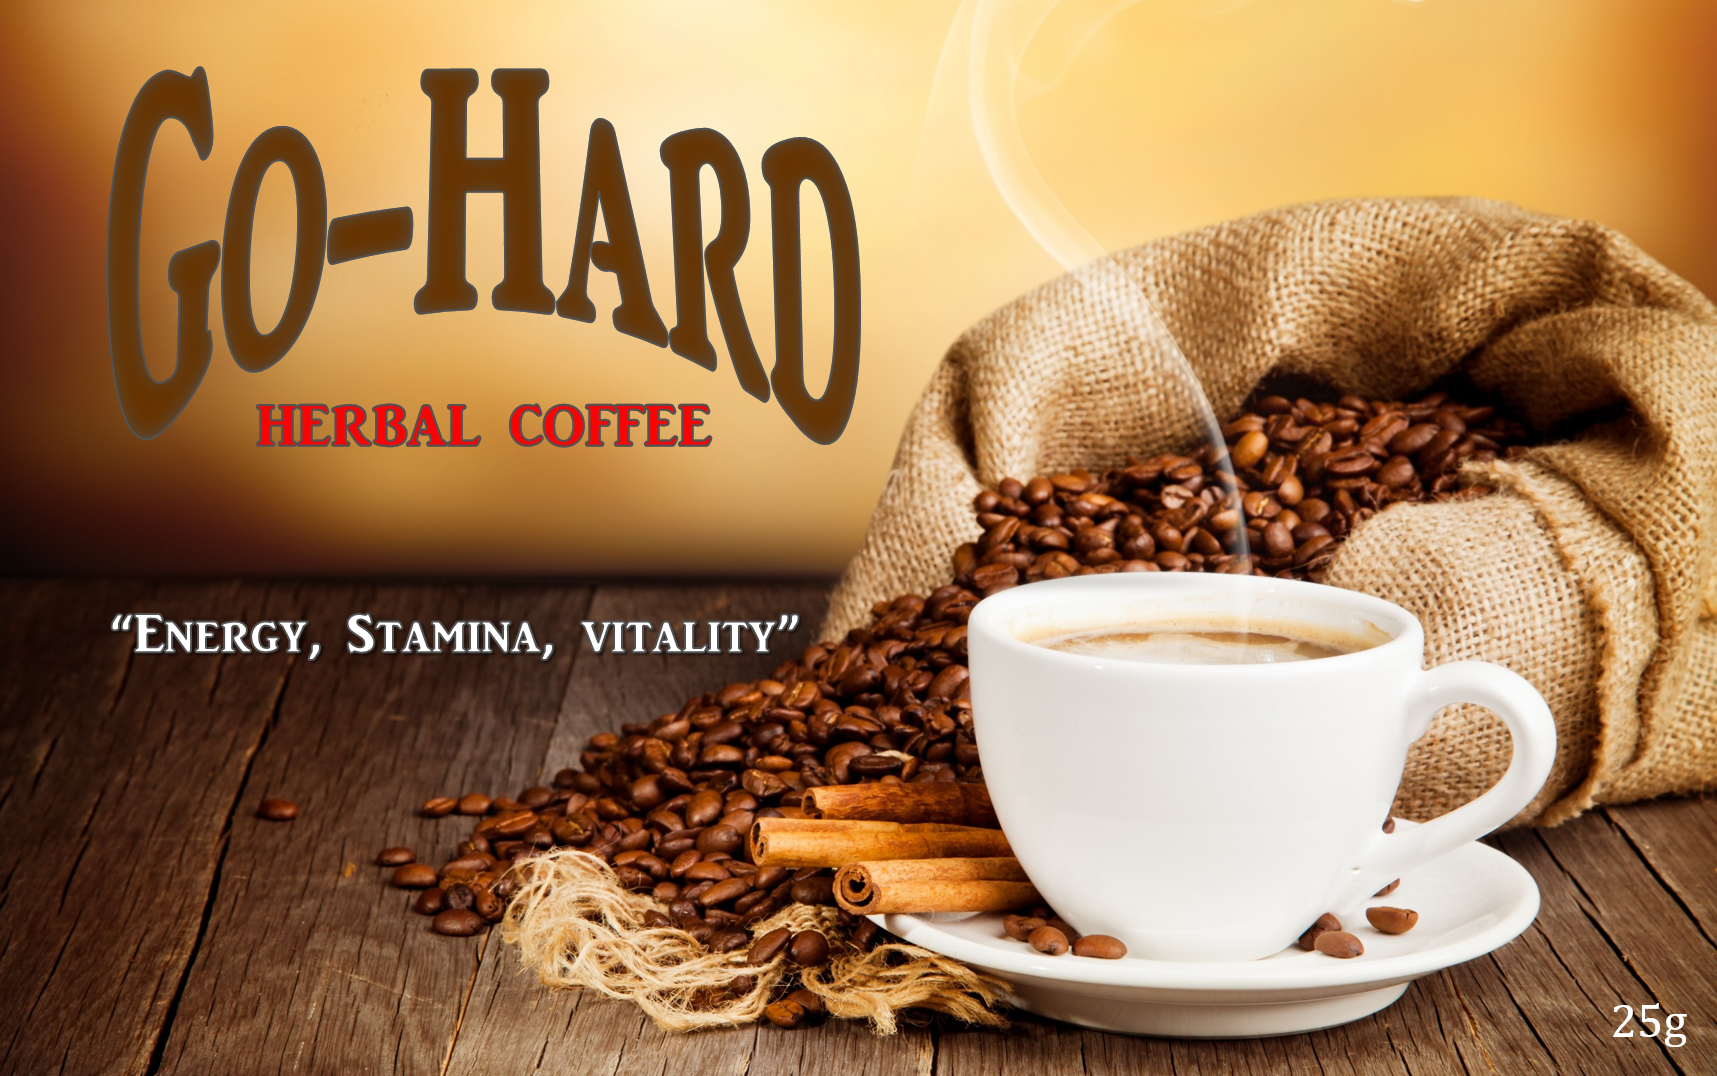 GO-HARD COFFEE 3 PACKS 00001